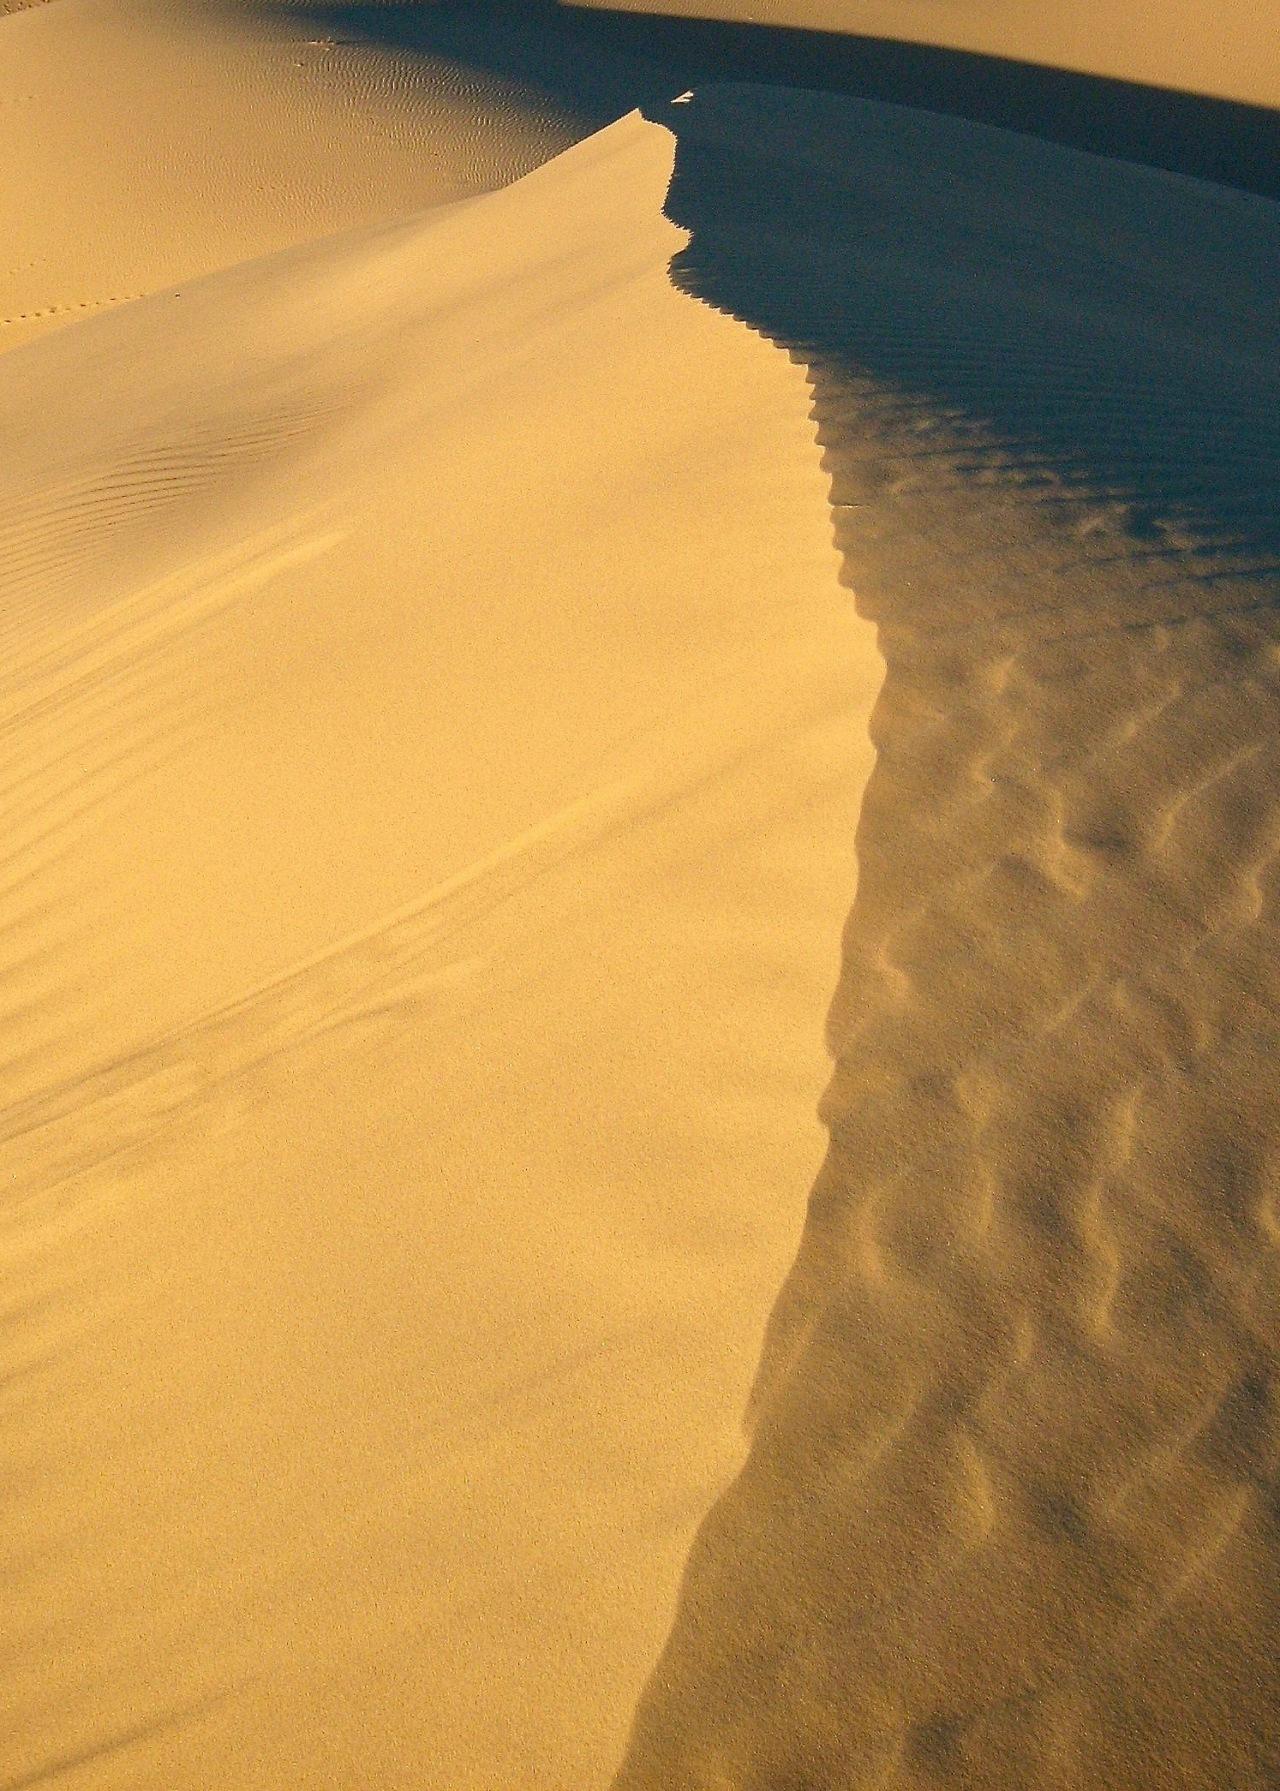 Dune Monahans Sandhills SP TX 10-2007